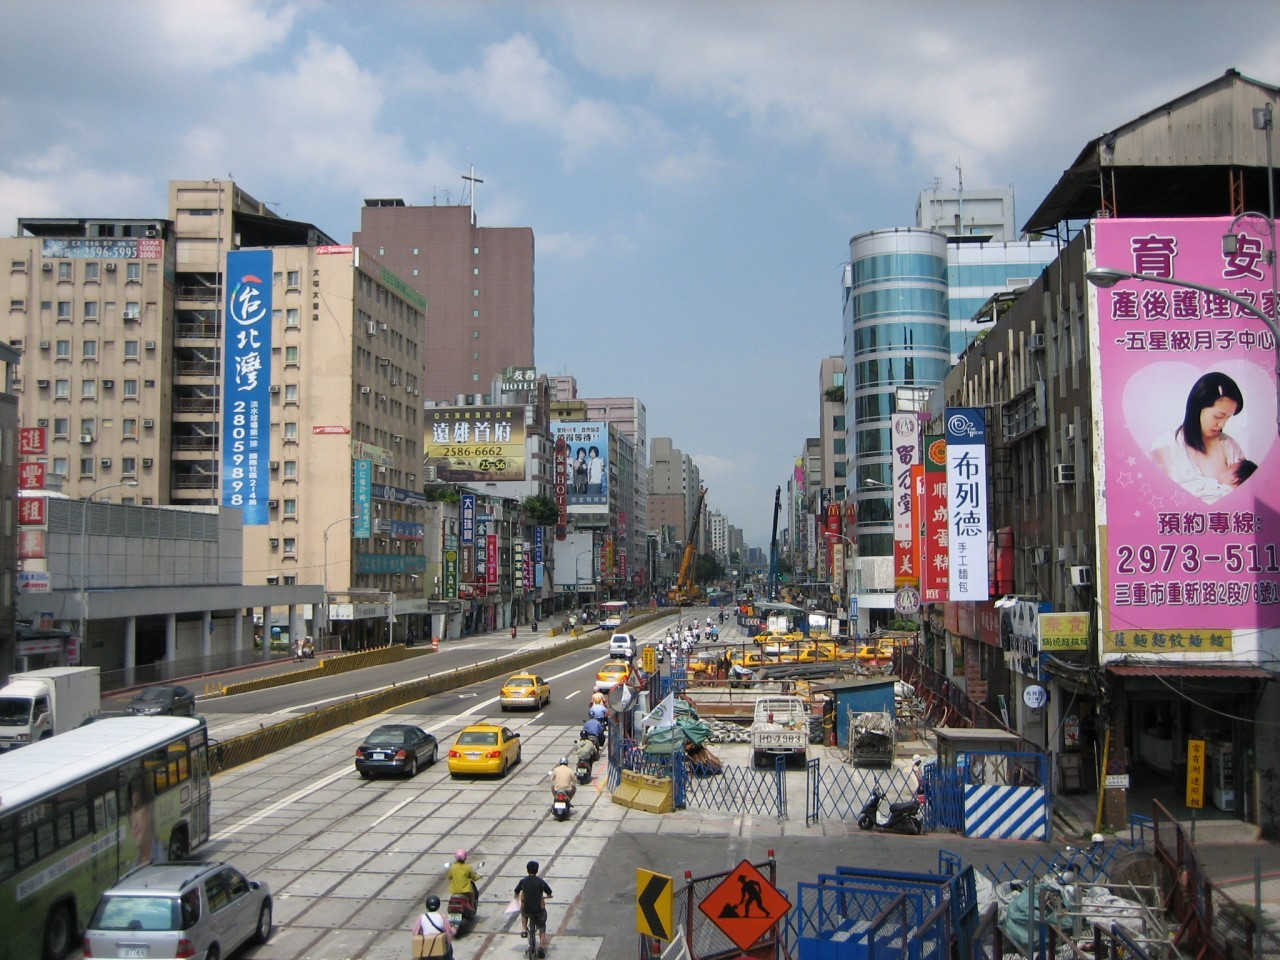 Streets in Taiwan